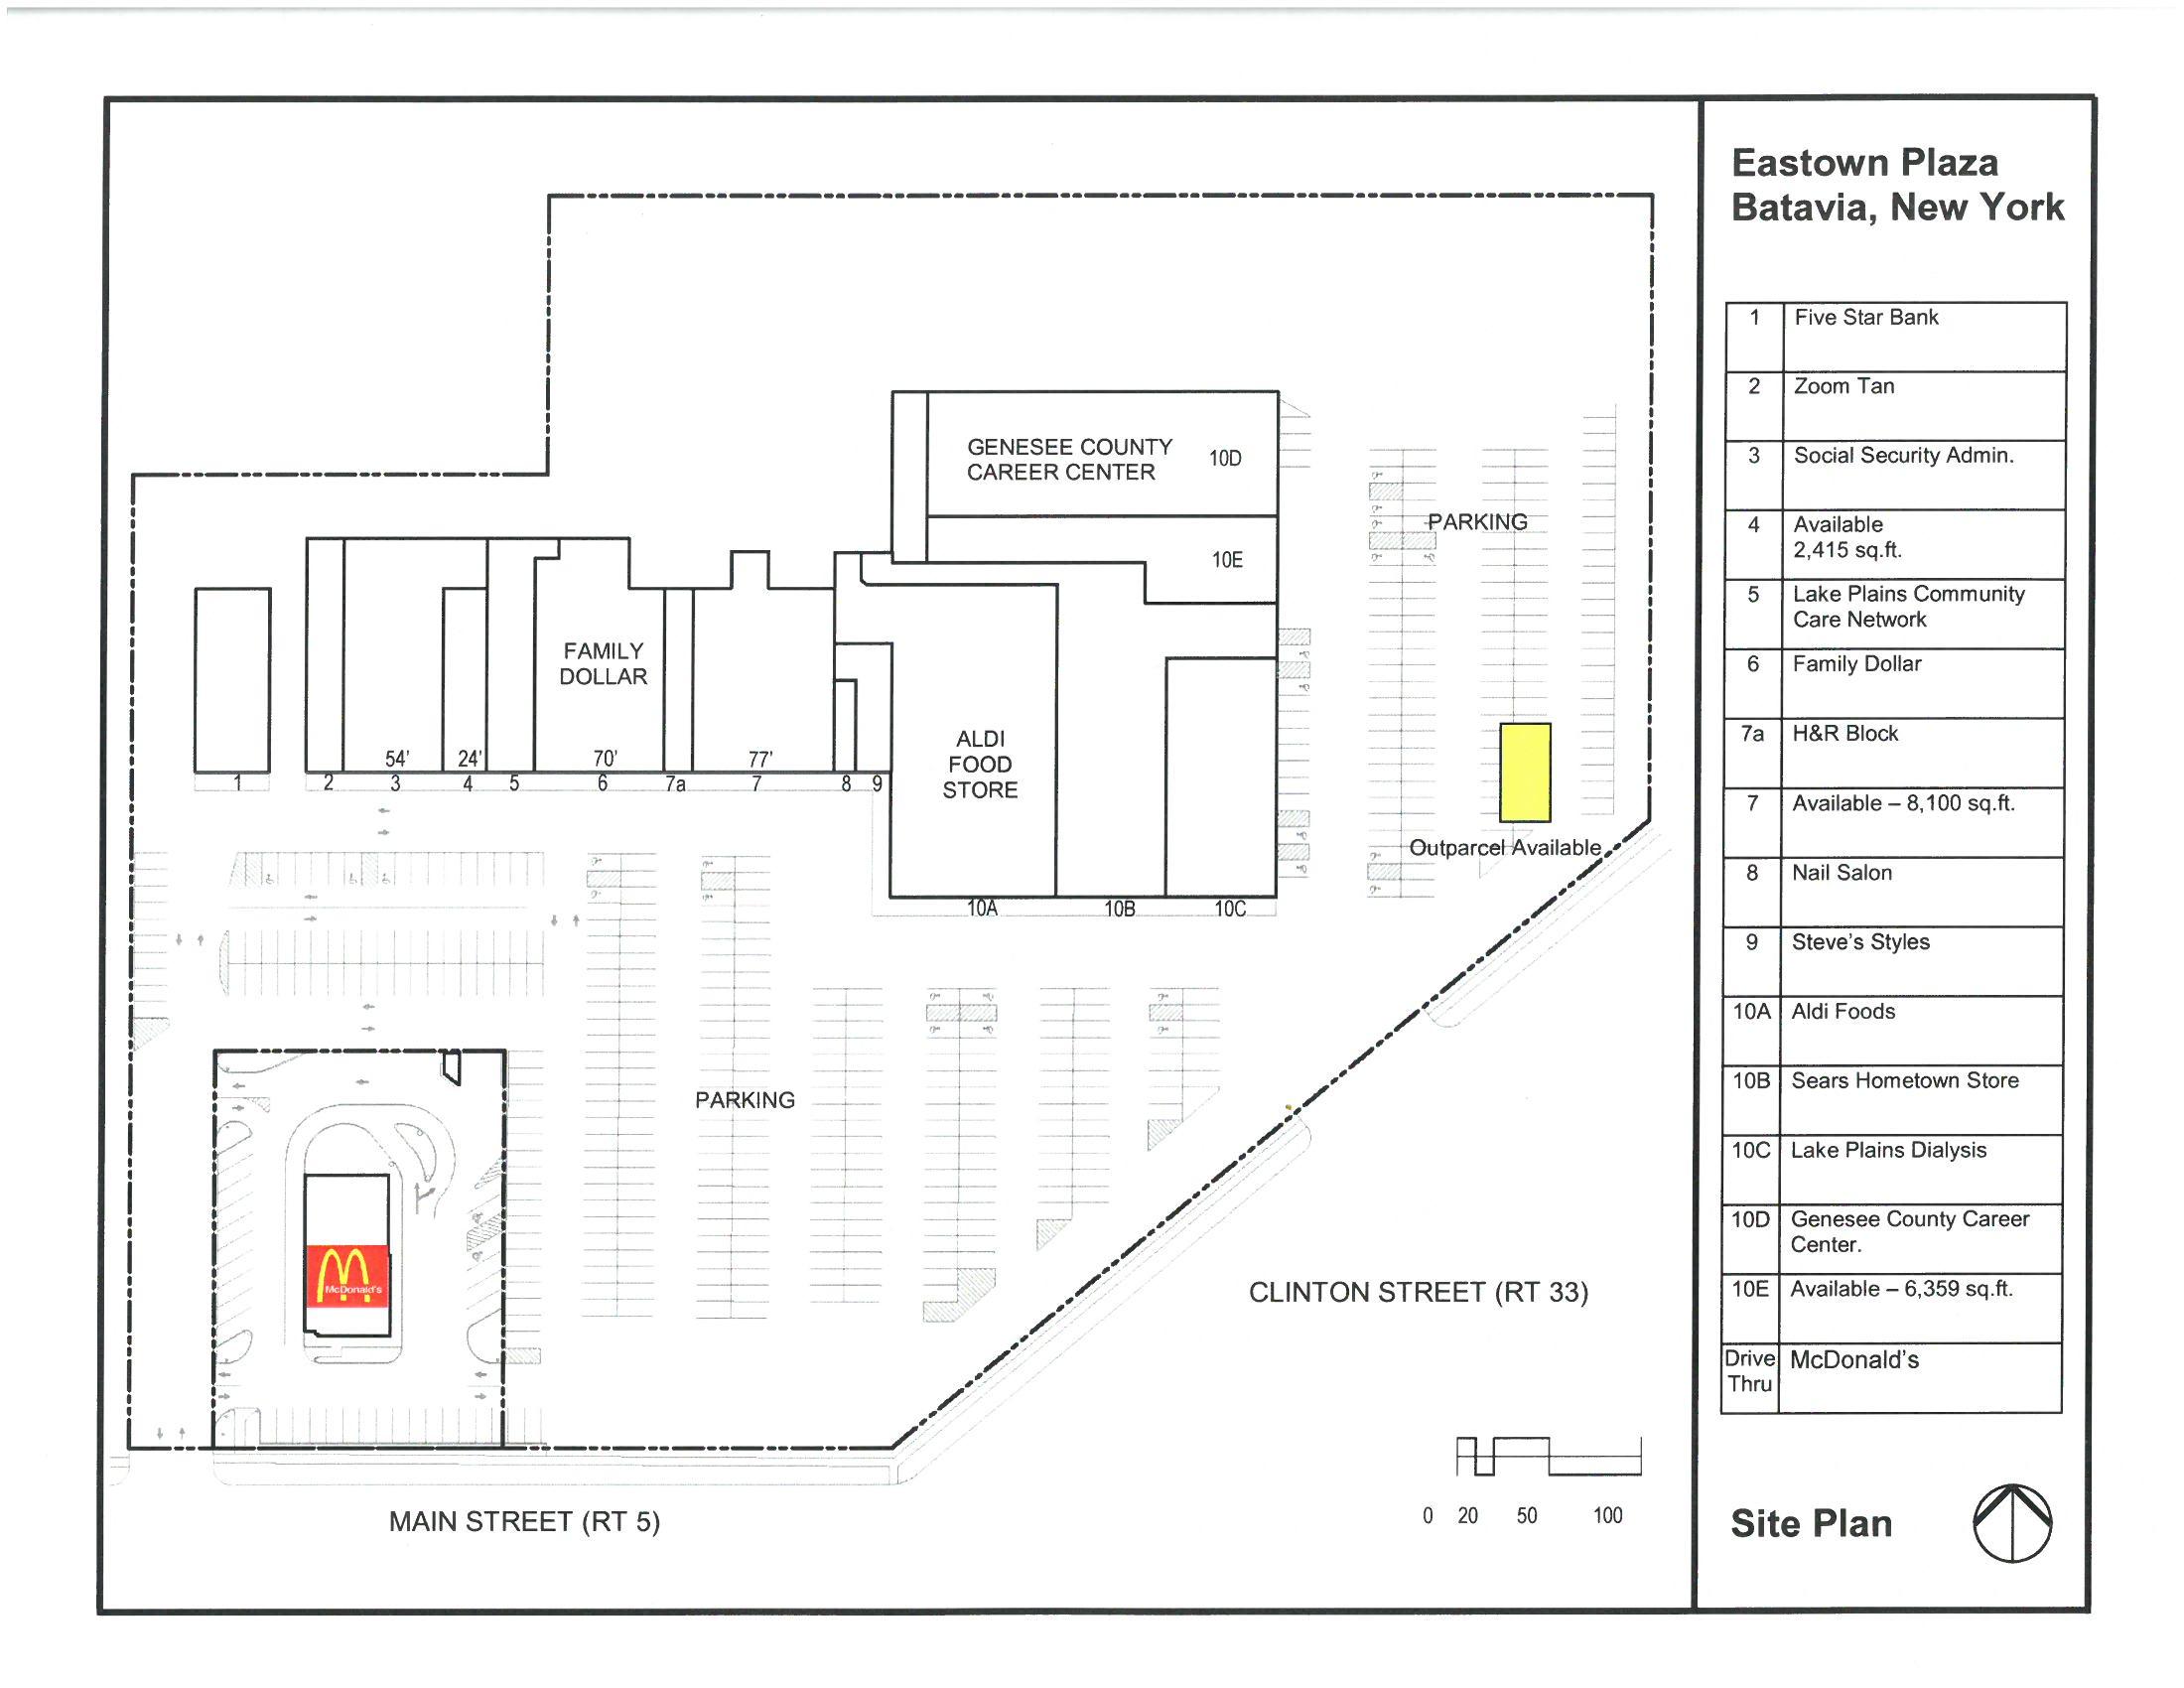 Eastown Plaza Leasing Plan